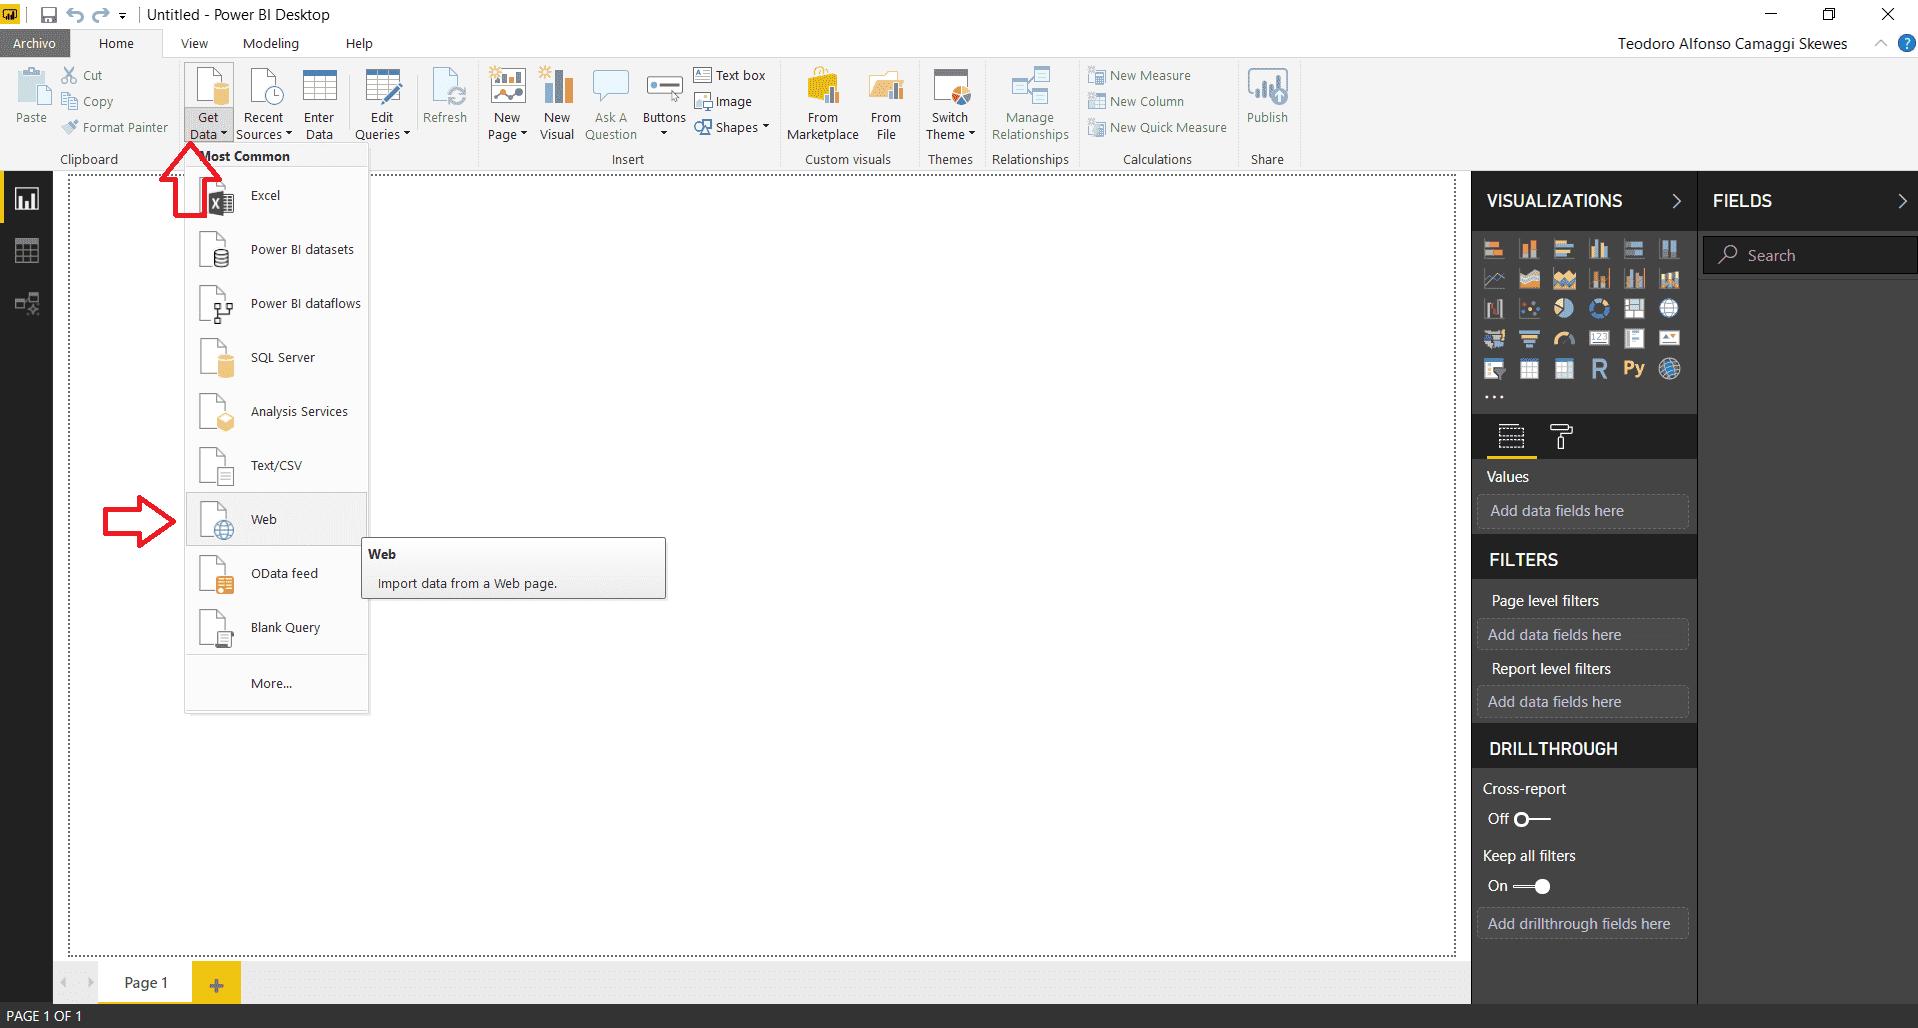 step-1-Power BI & PowerQuery